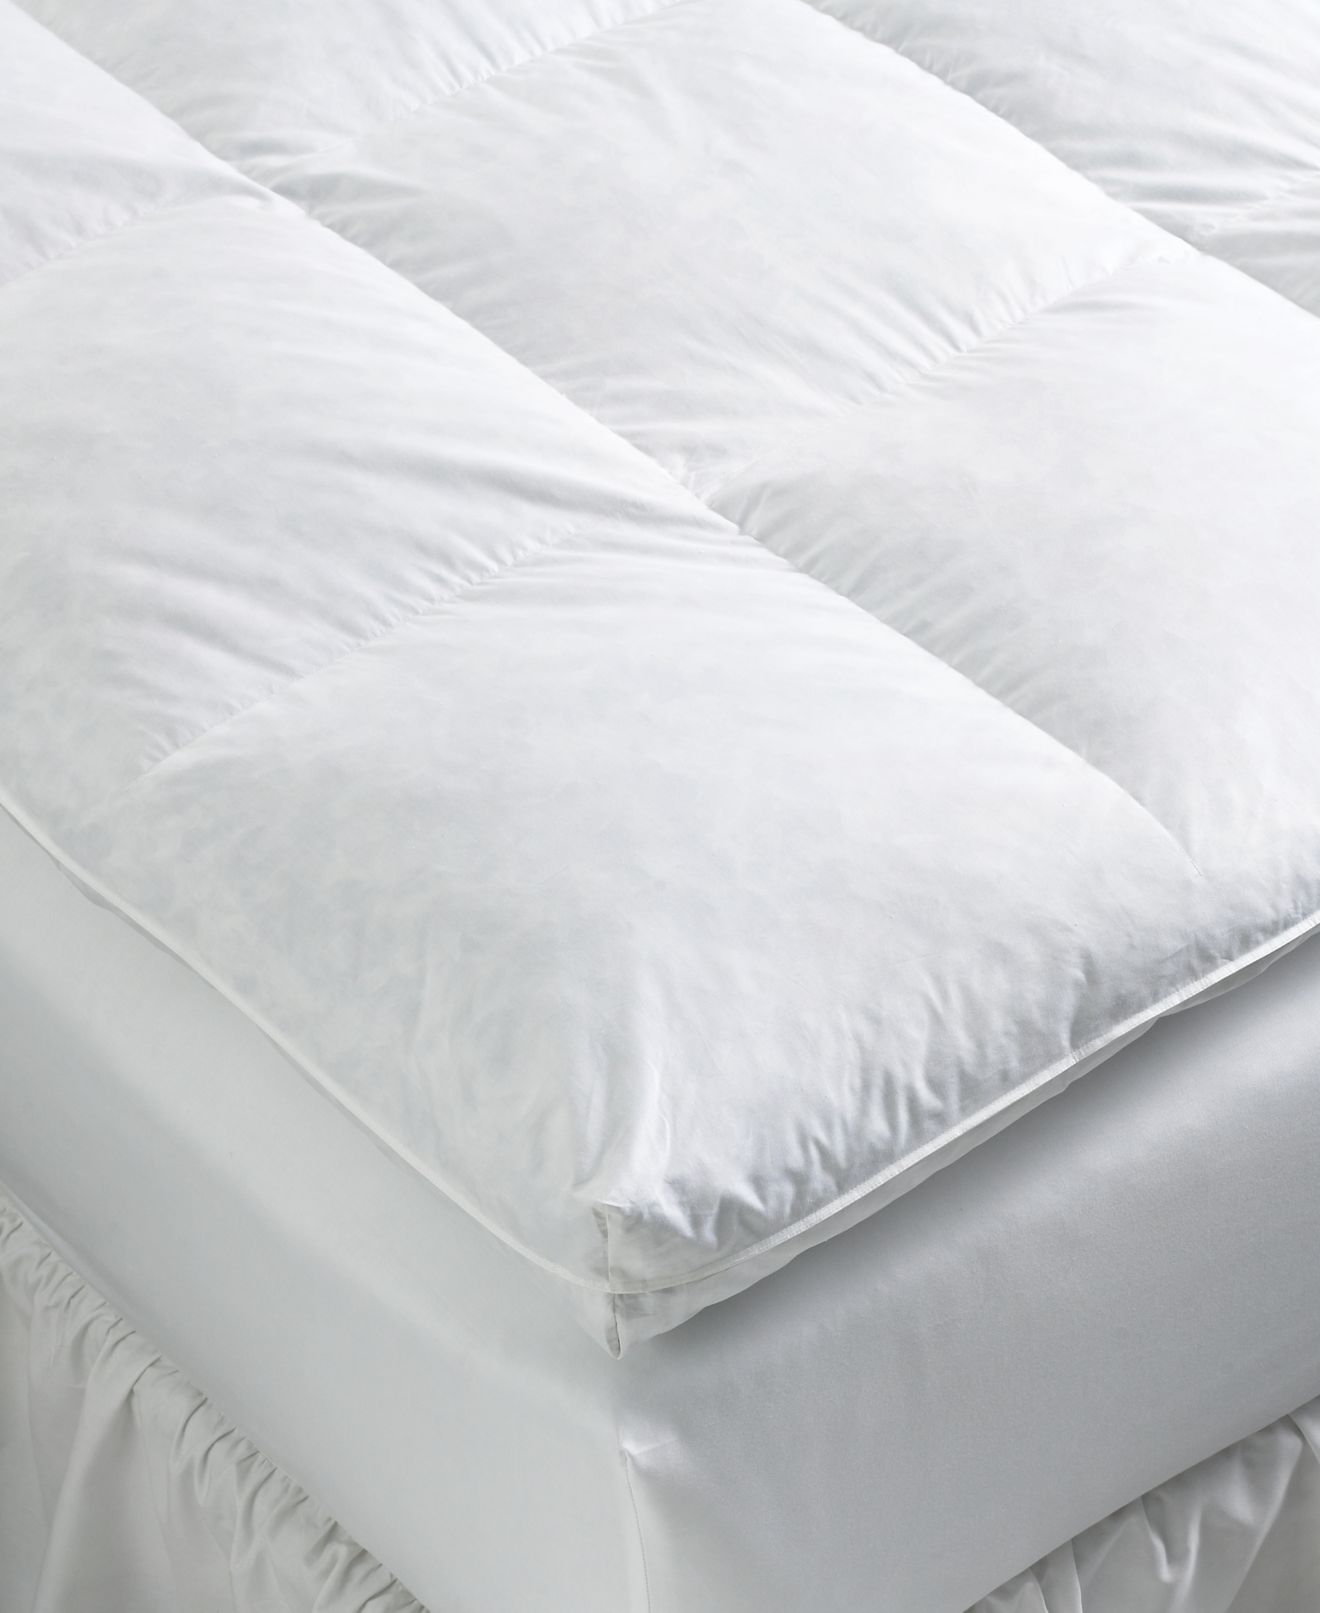 pacific coast true baffle box featherbeds - mattress pads